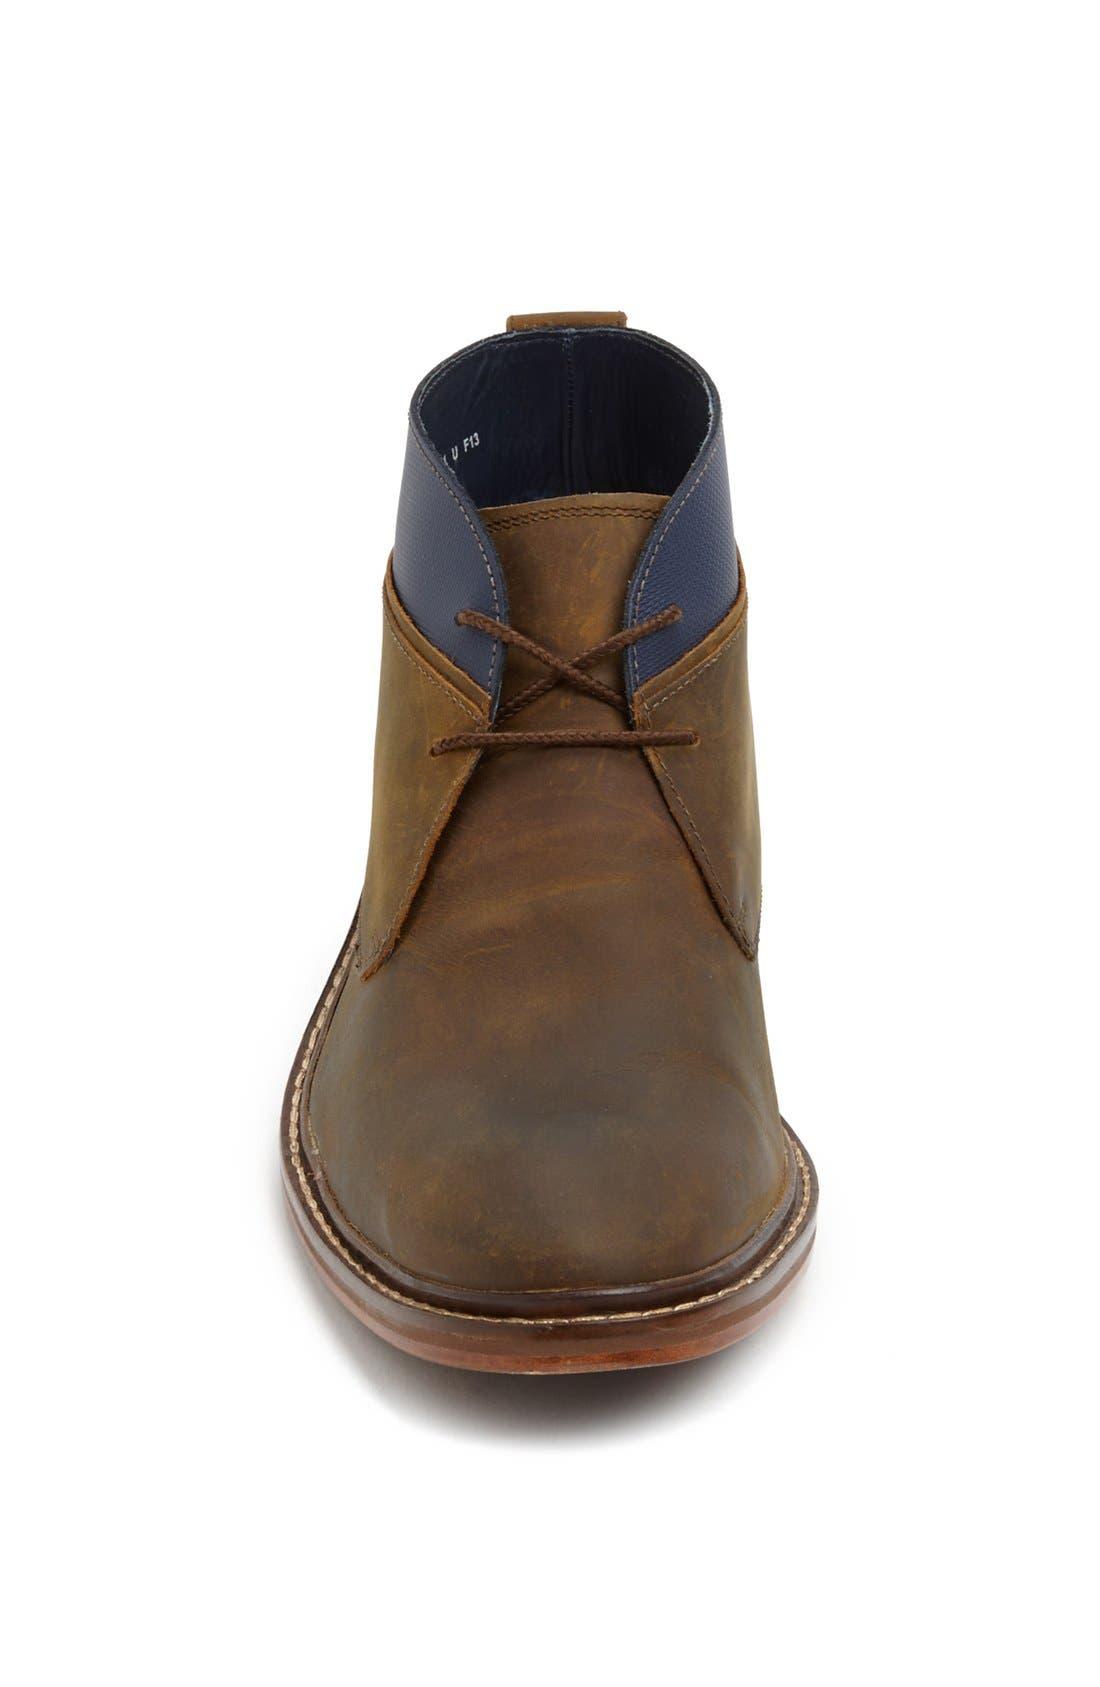 'Colton' Chukka Boot,                             Alternate thumbnail 4, color,                             Copper/ Peacoat Leather